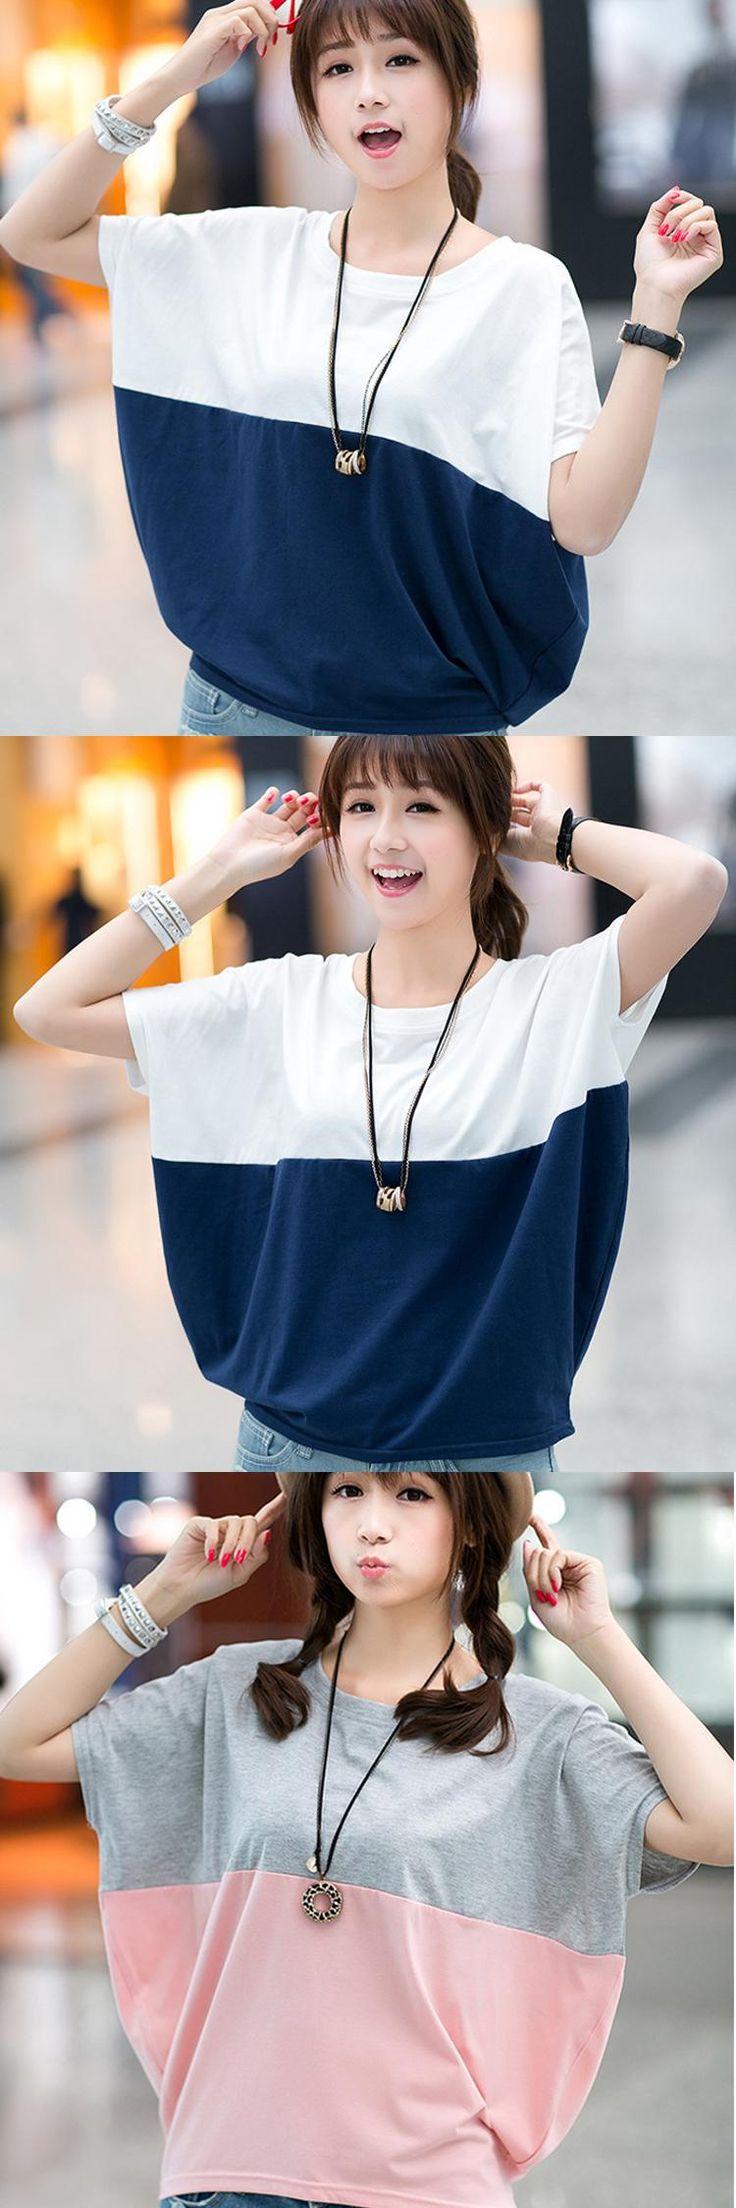 New Sexy Elegant Women tops Short Batwing Sleeve O-Neck Cotton Spring Summer Women T-Shirt Plus Size Loose Female T-Shirt